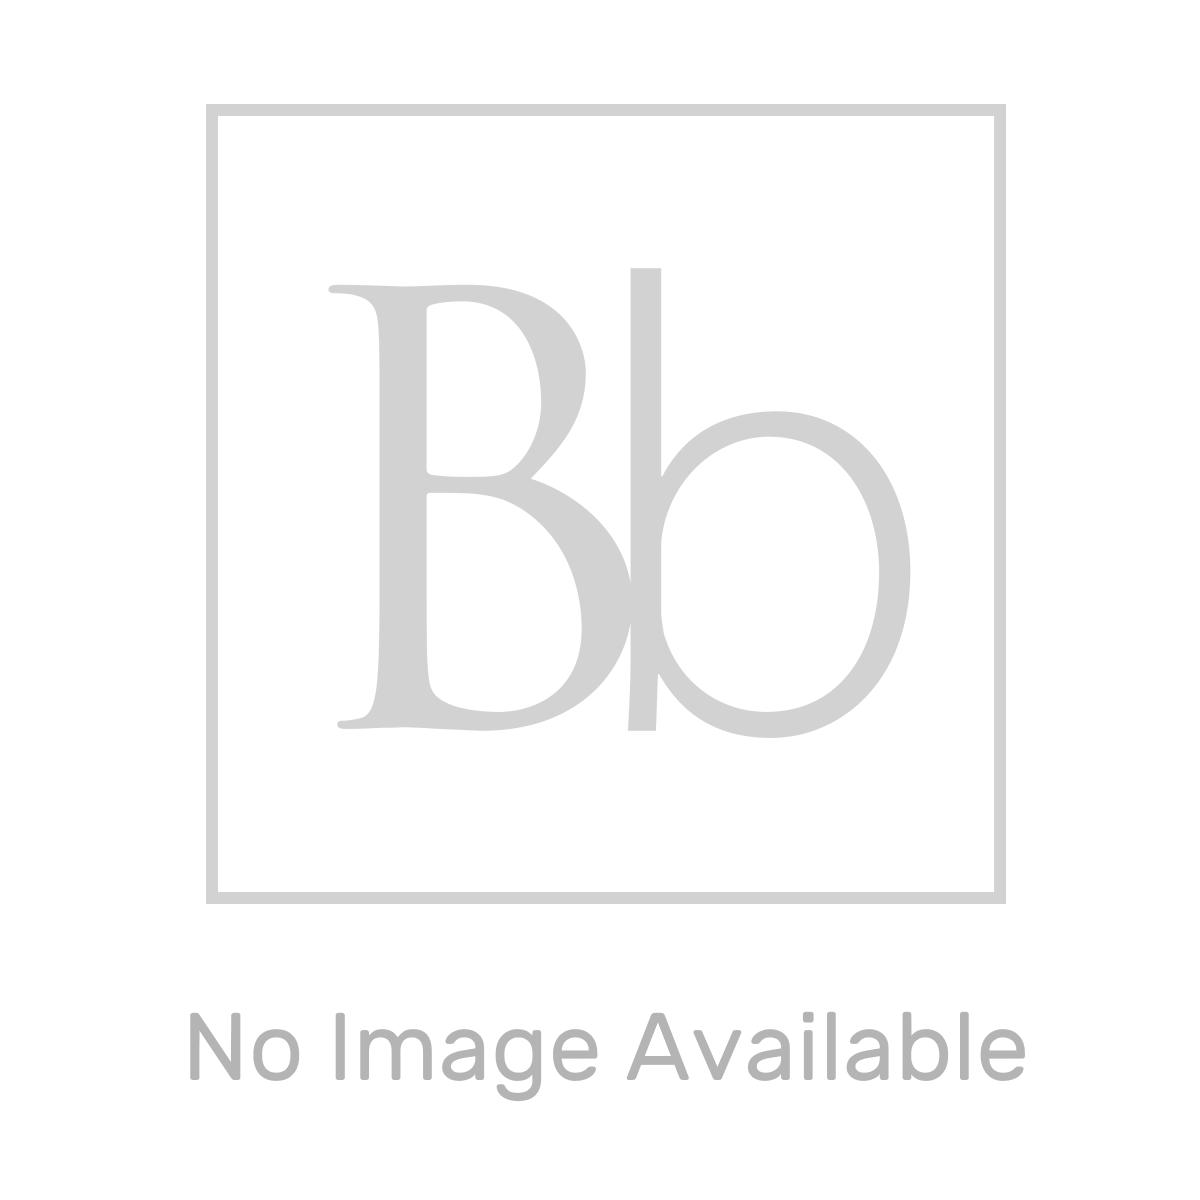 Premier High Gloss White Vanity Unit 550mm Dimensions